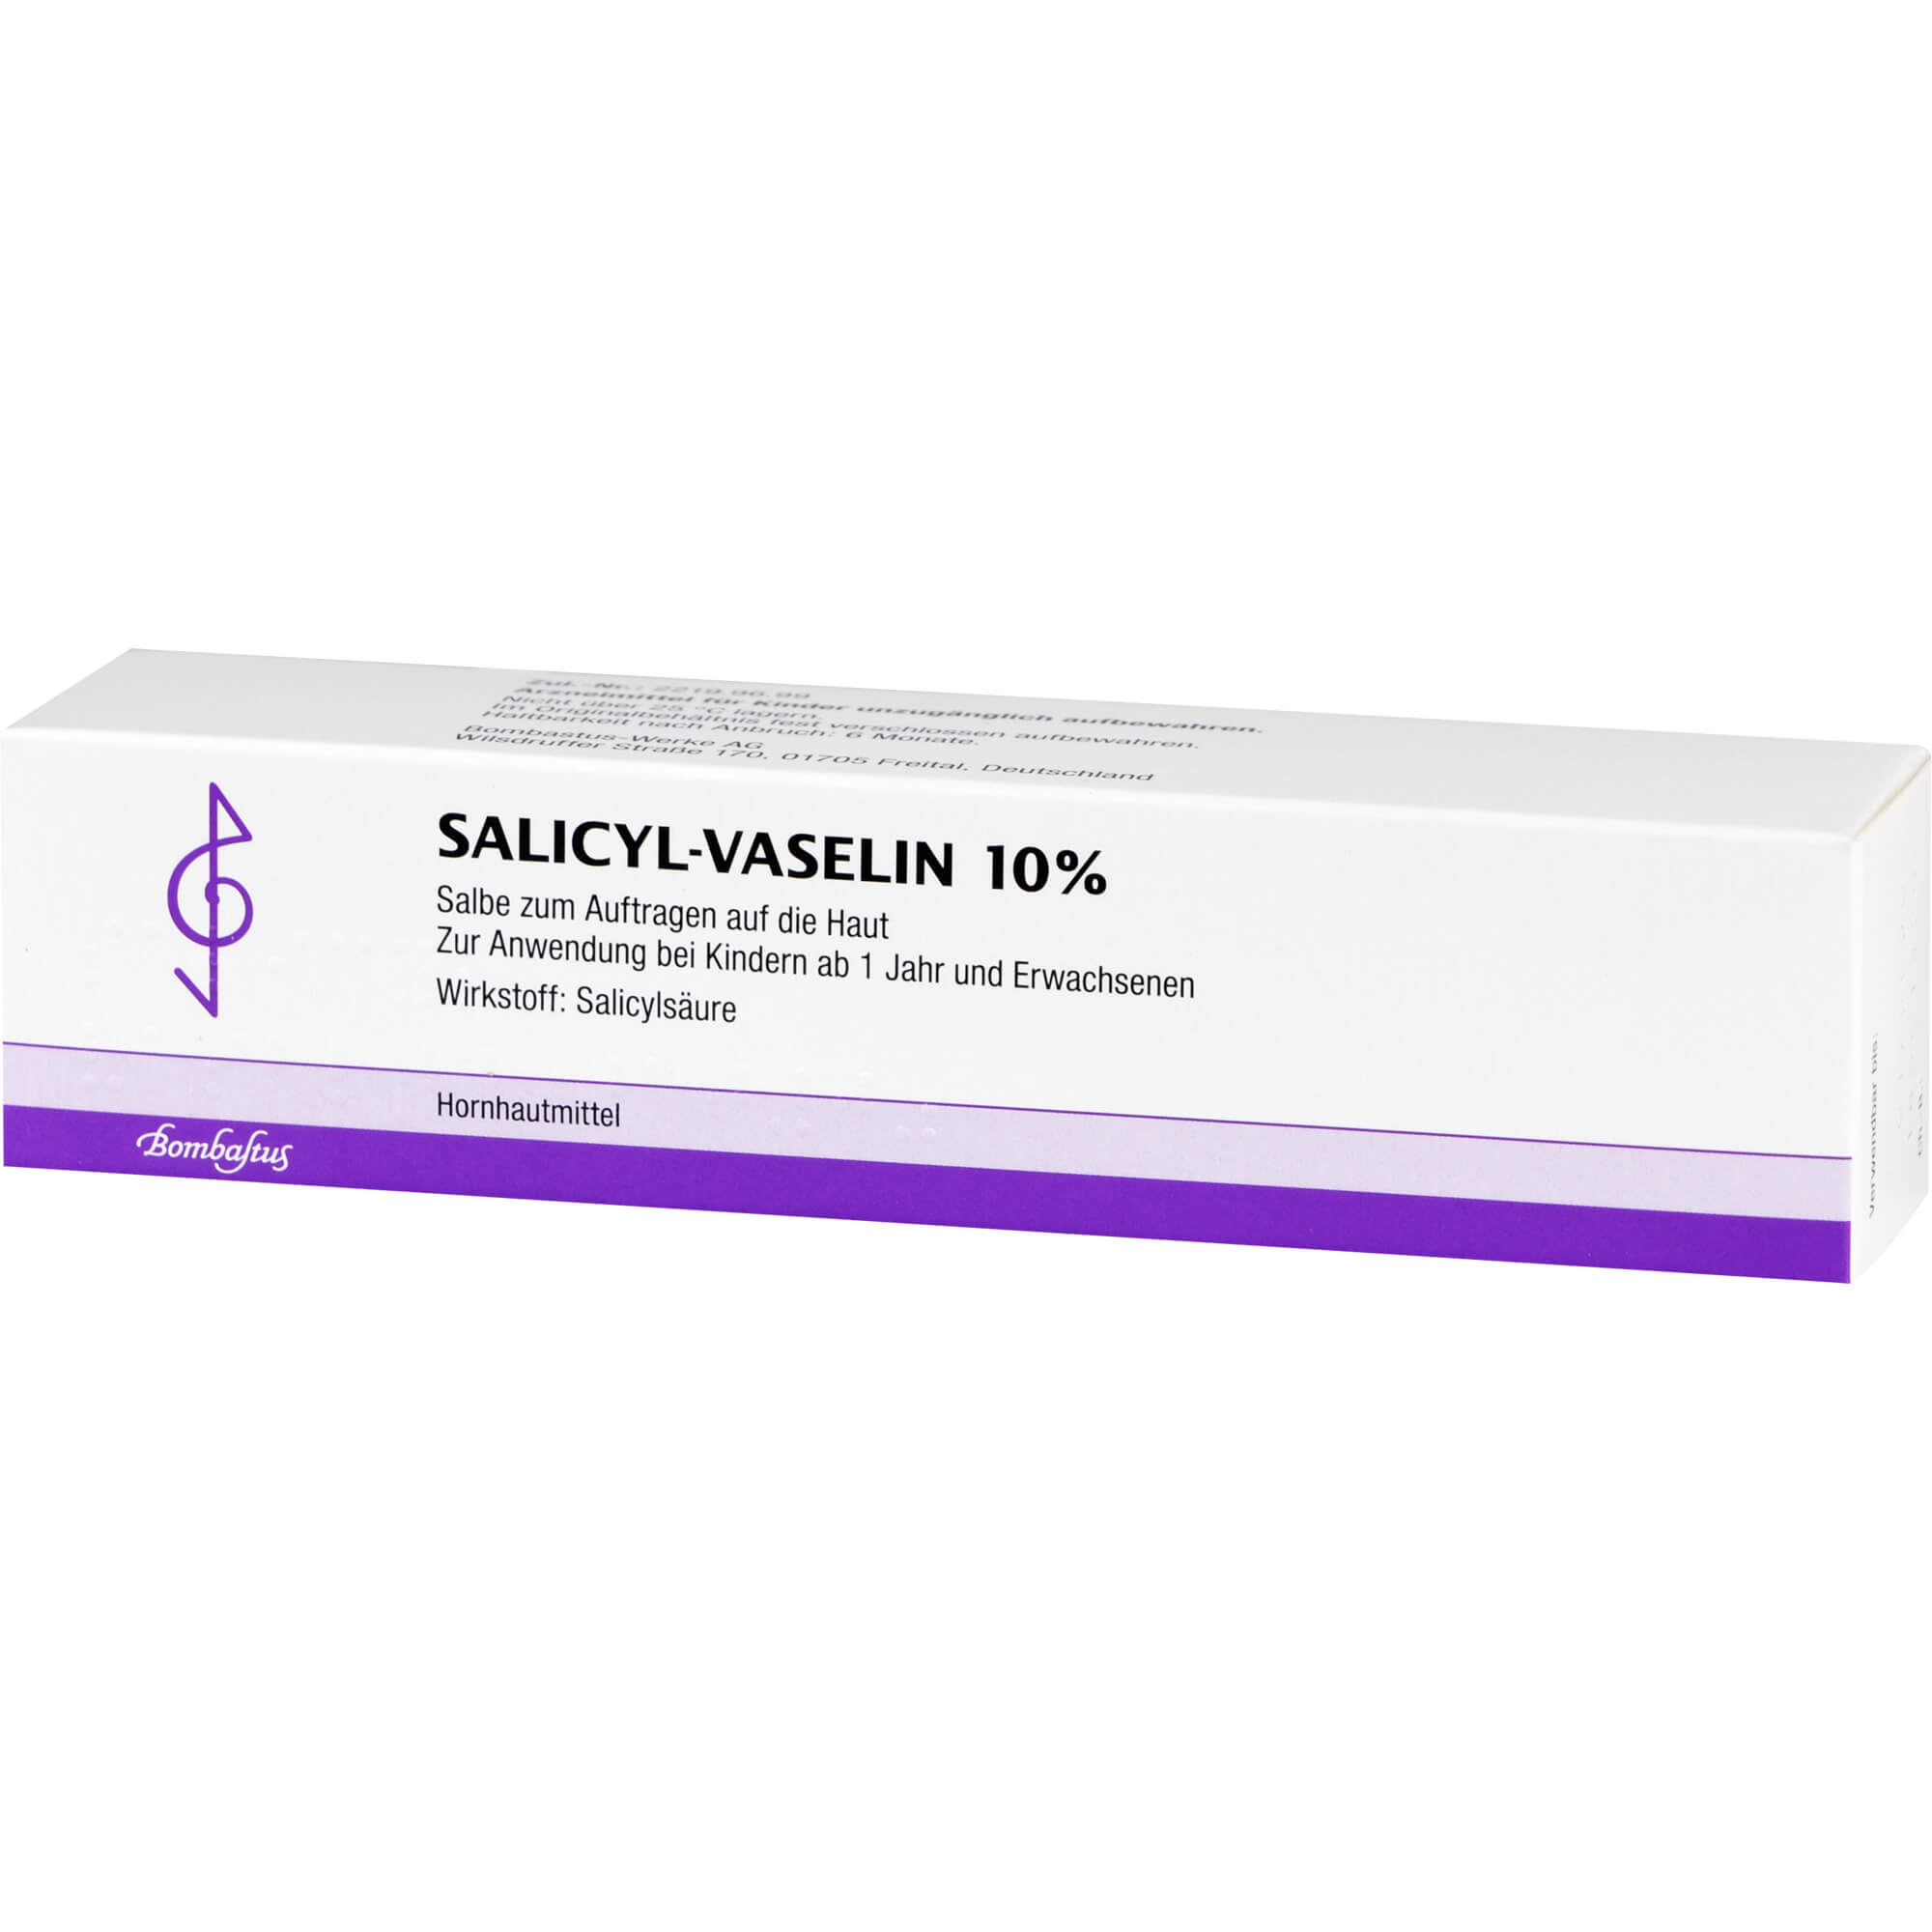 SALICYL VASELIN 10% Salbe